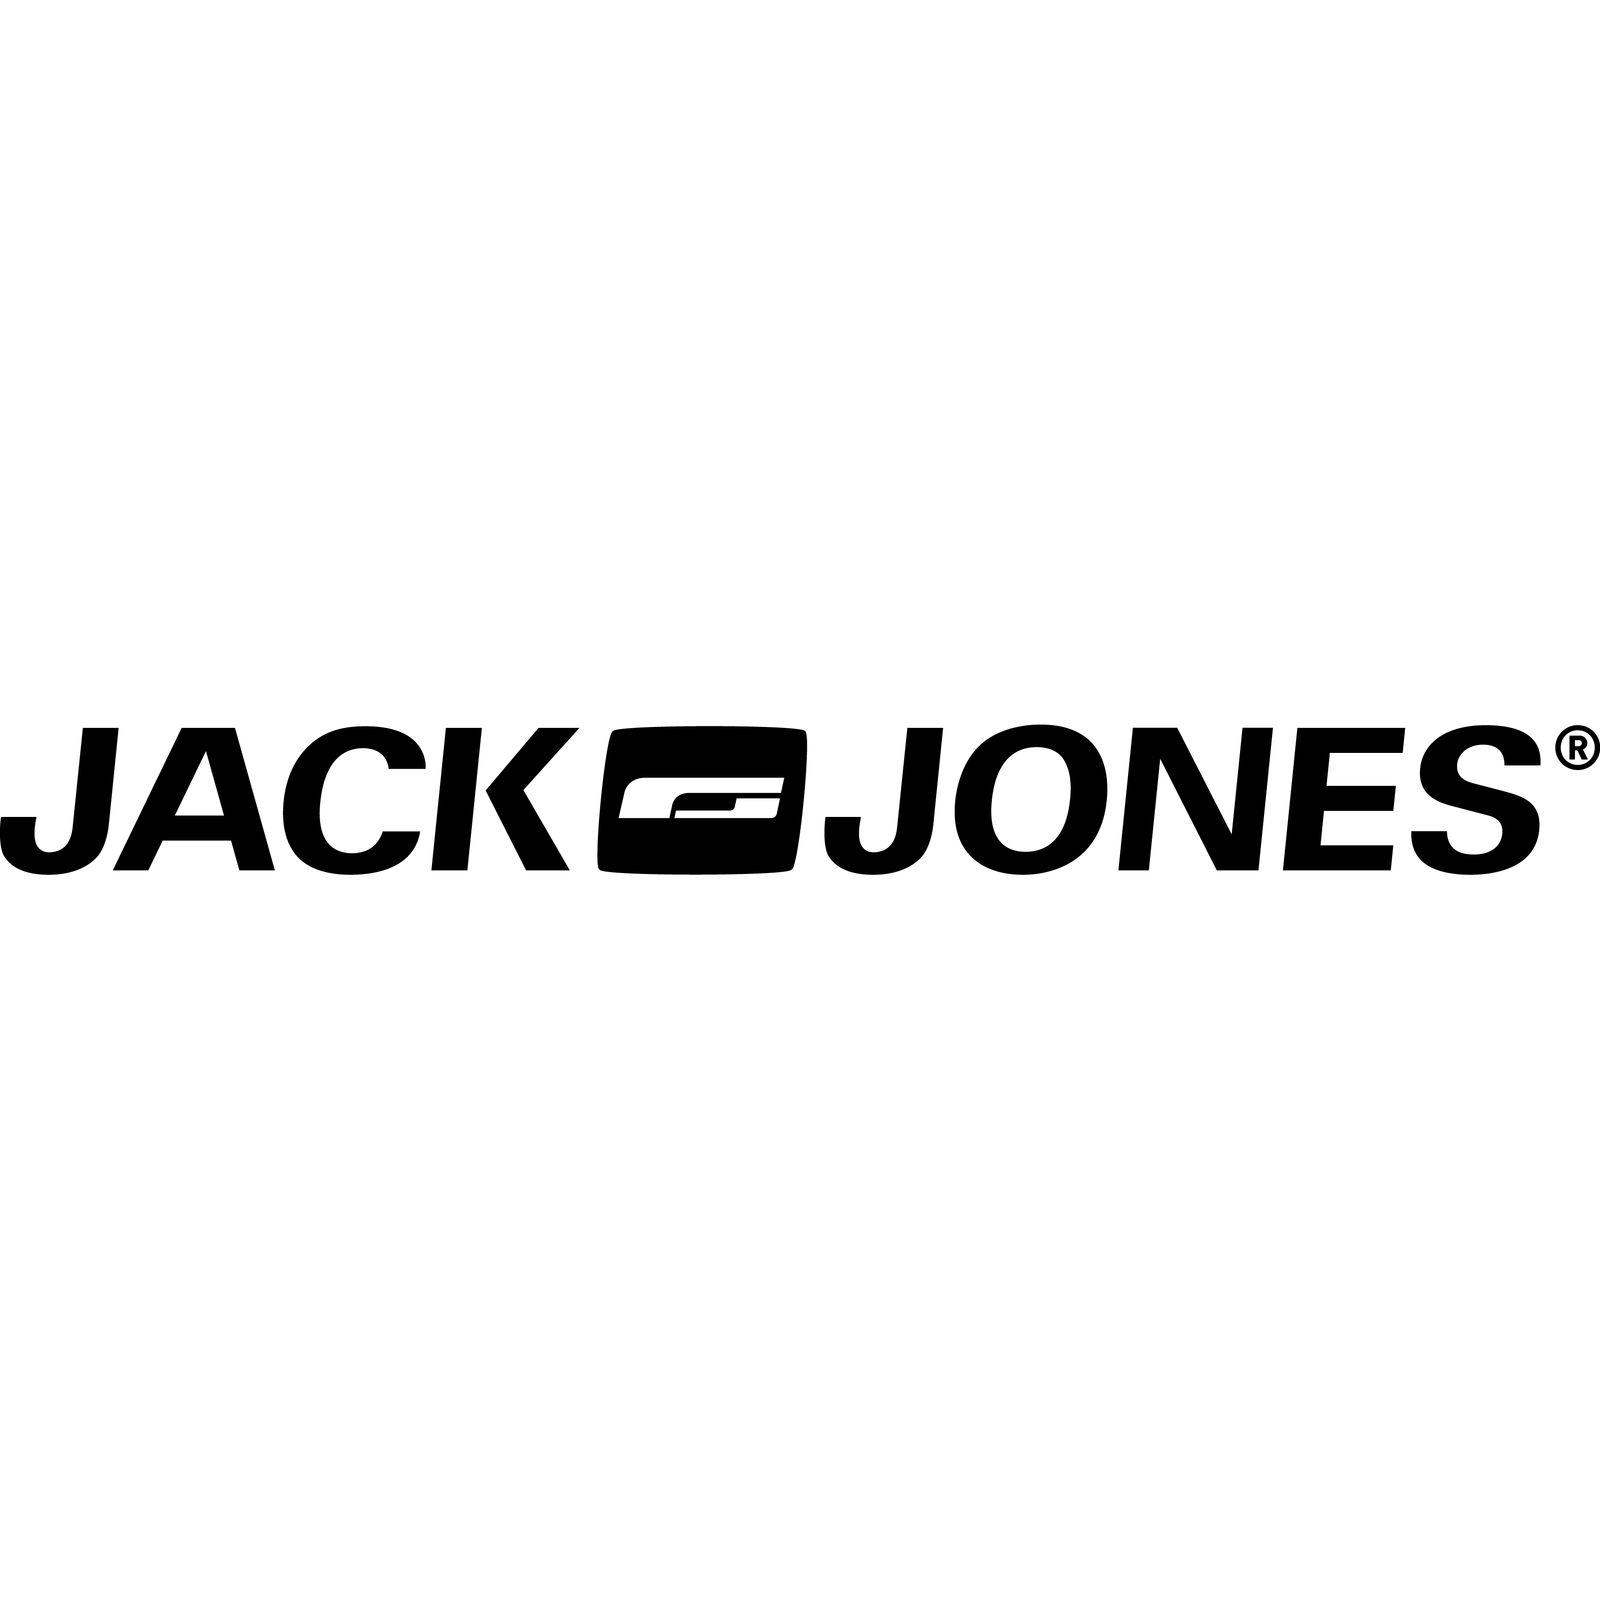 JACK & JONES (Bild 1)